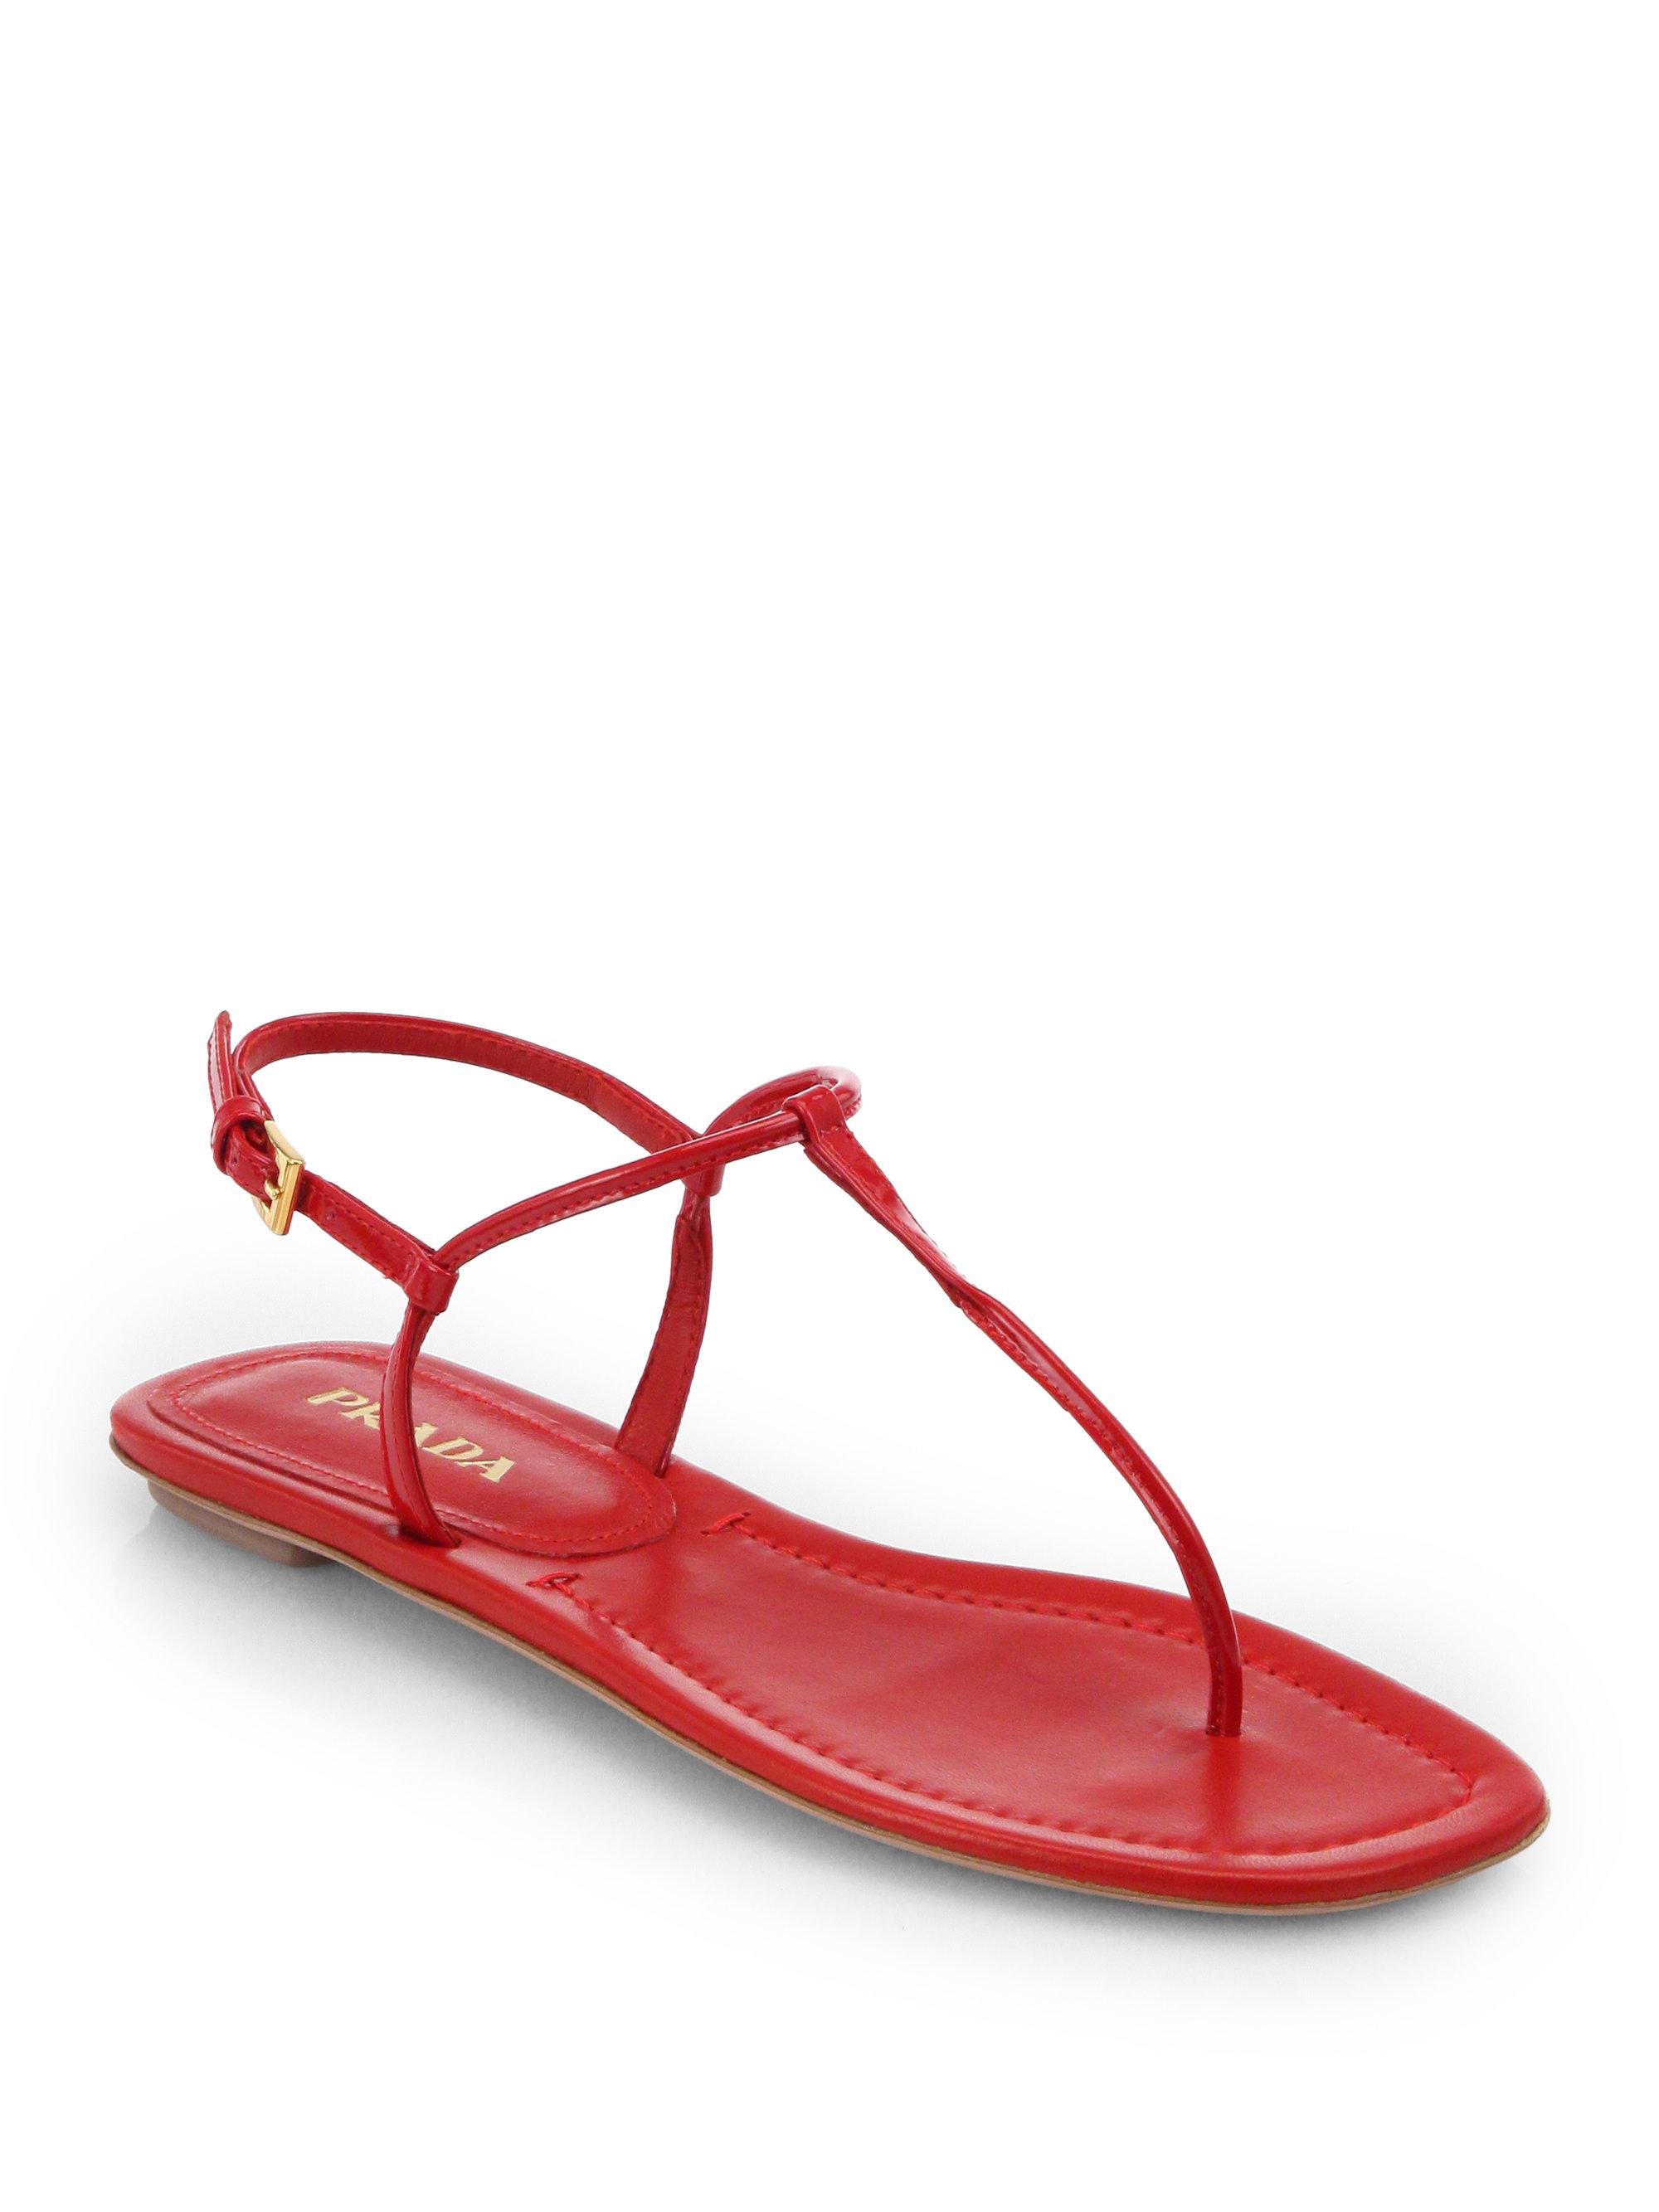 Prada Flat Shoes Uk